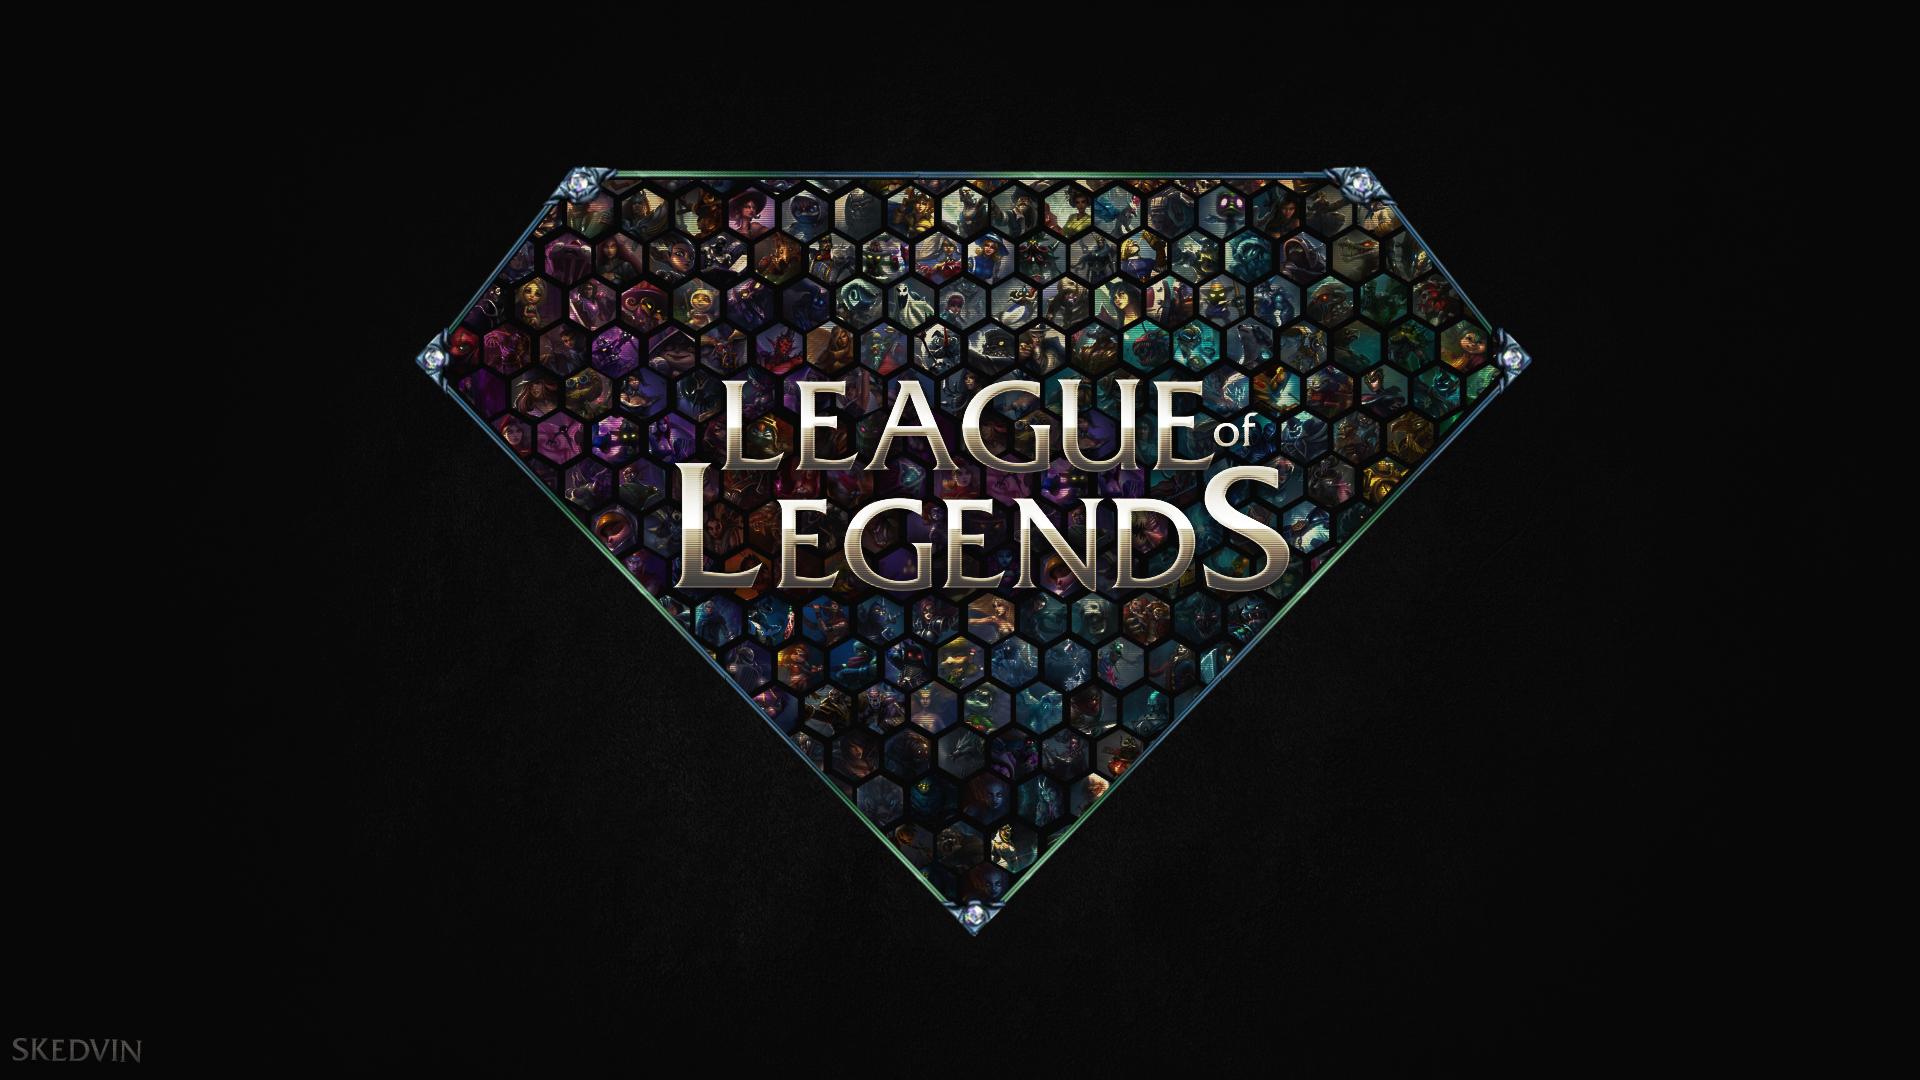 League of Legends wallpaper [19201080p] HD by SKEDVIN 1920x1080